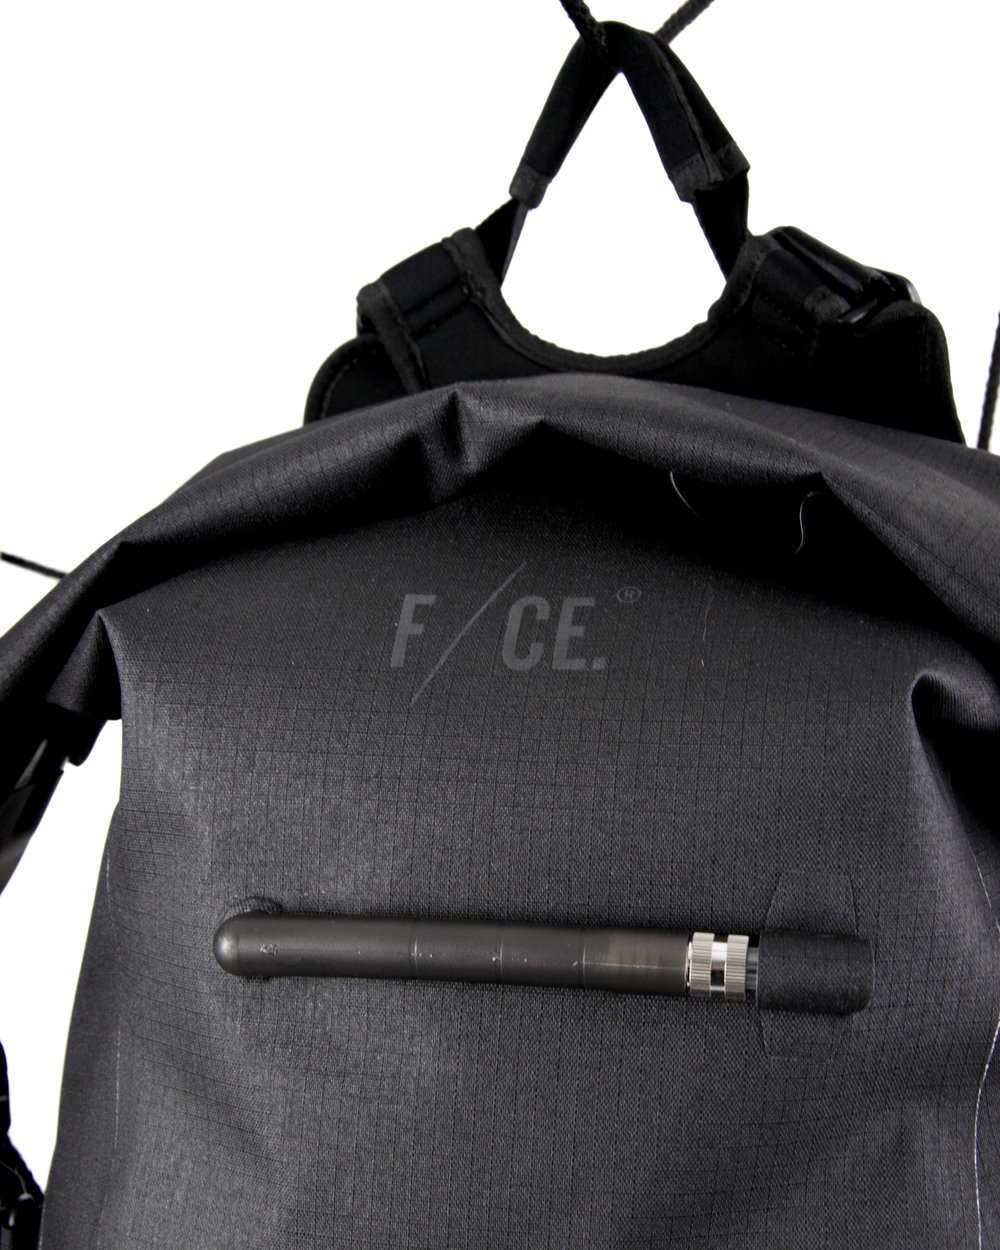 F-CE Feature3-10.jpg